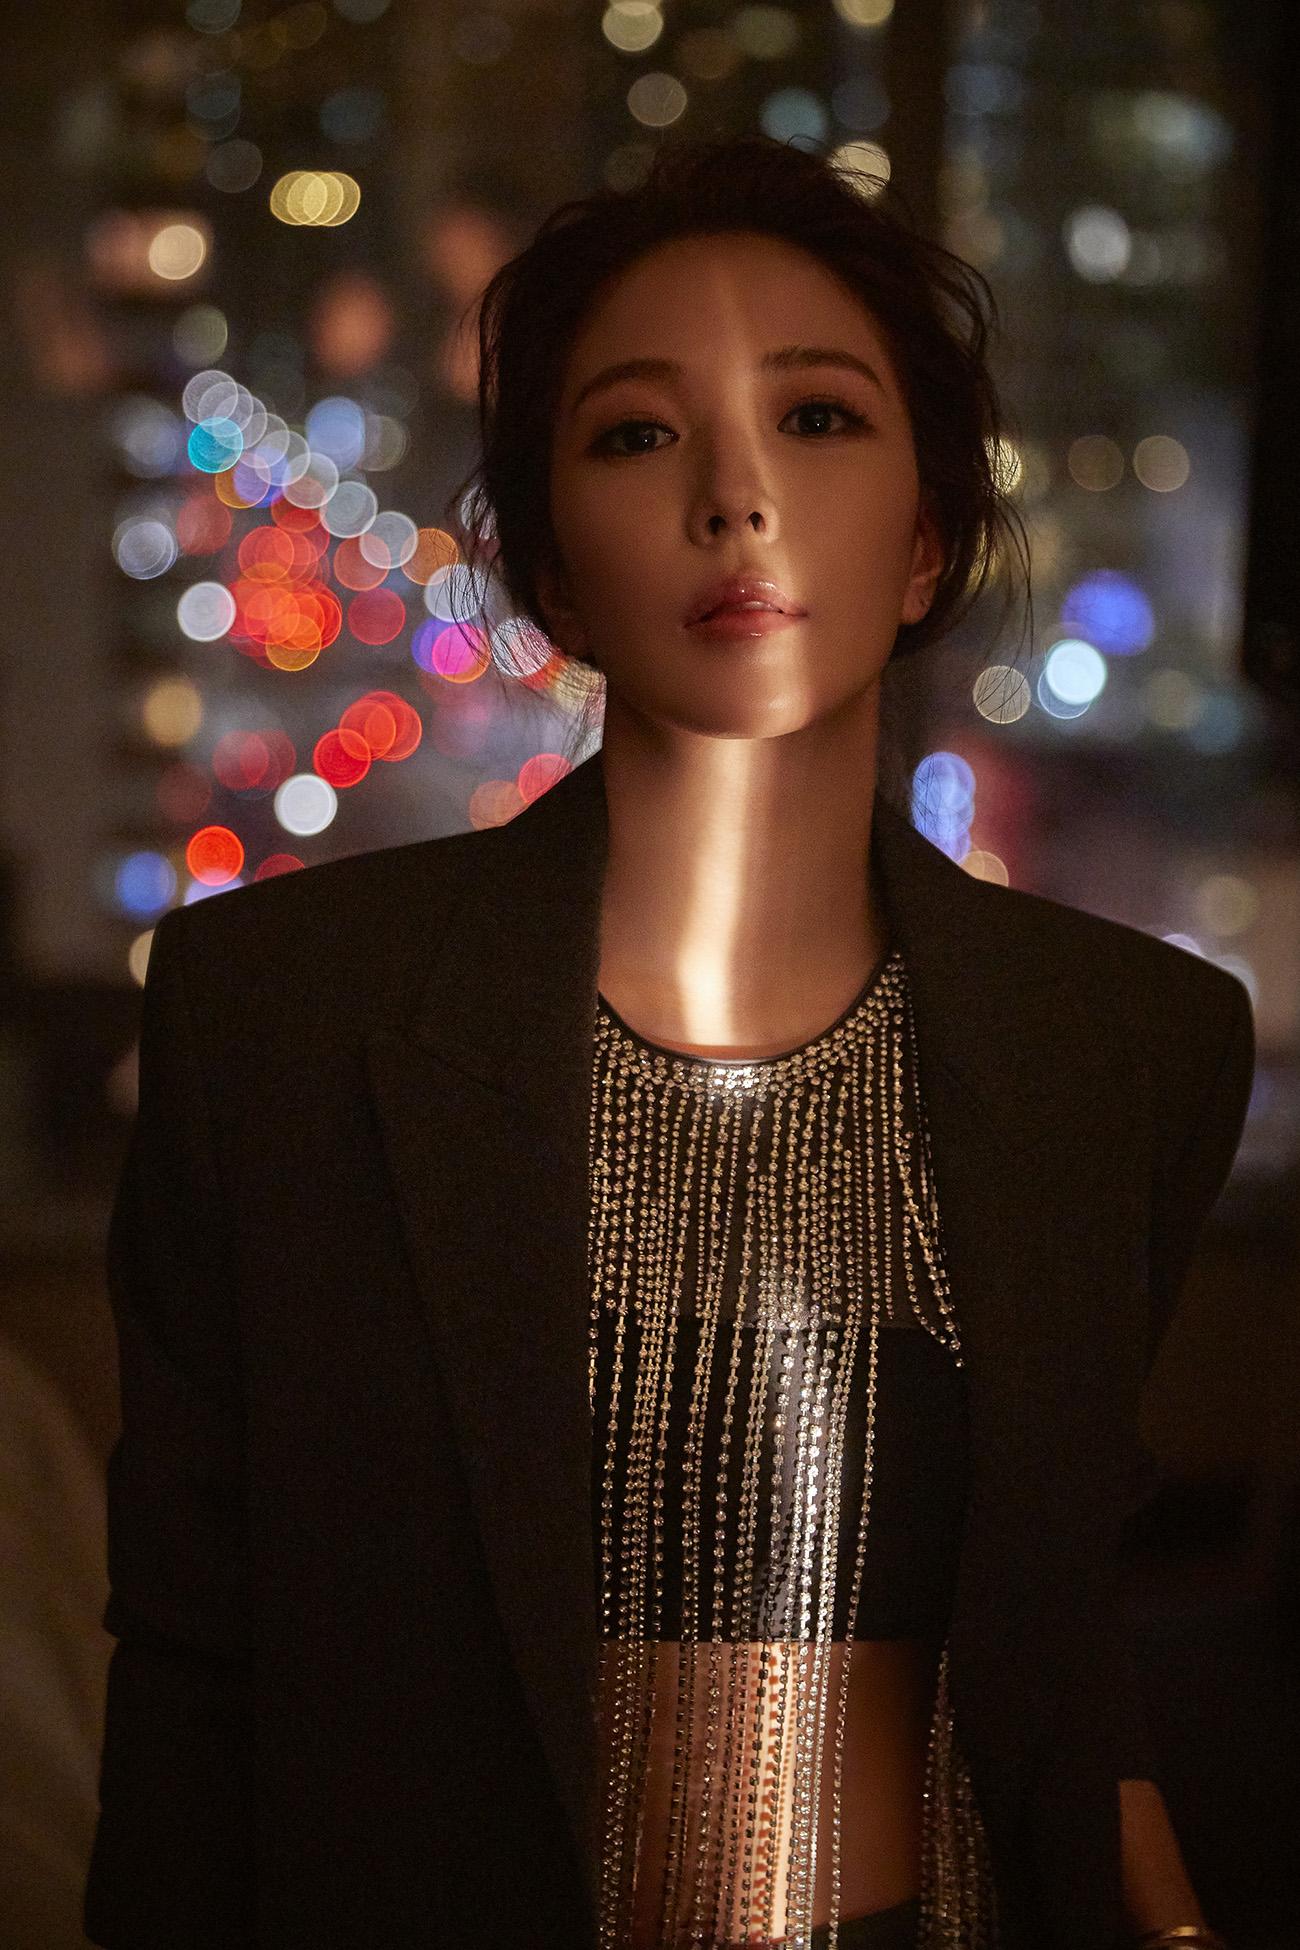 BoA 두 번째 미니앨범 Starry Night 티저 이미지1.JPG